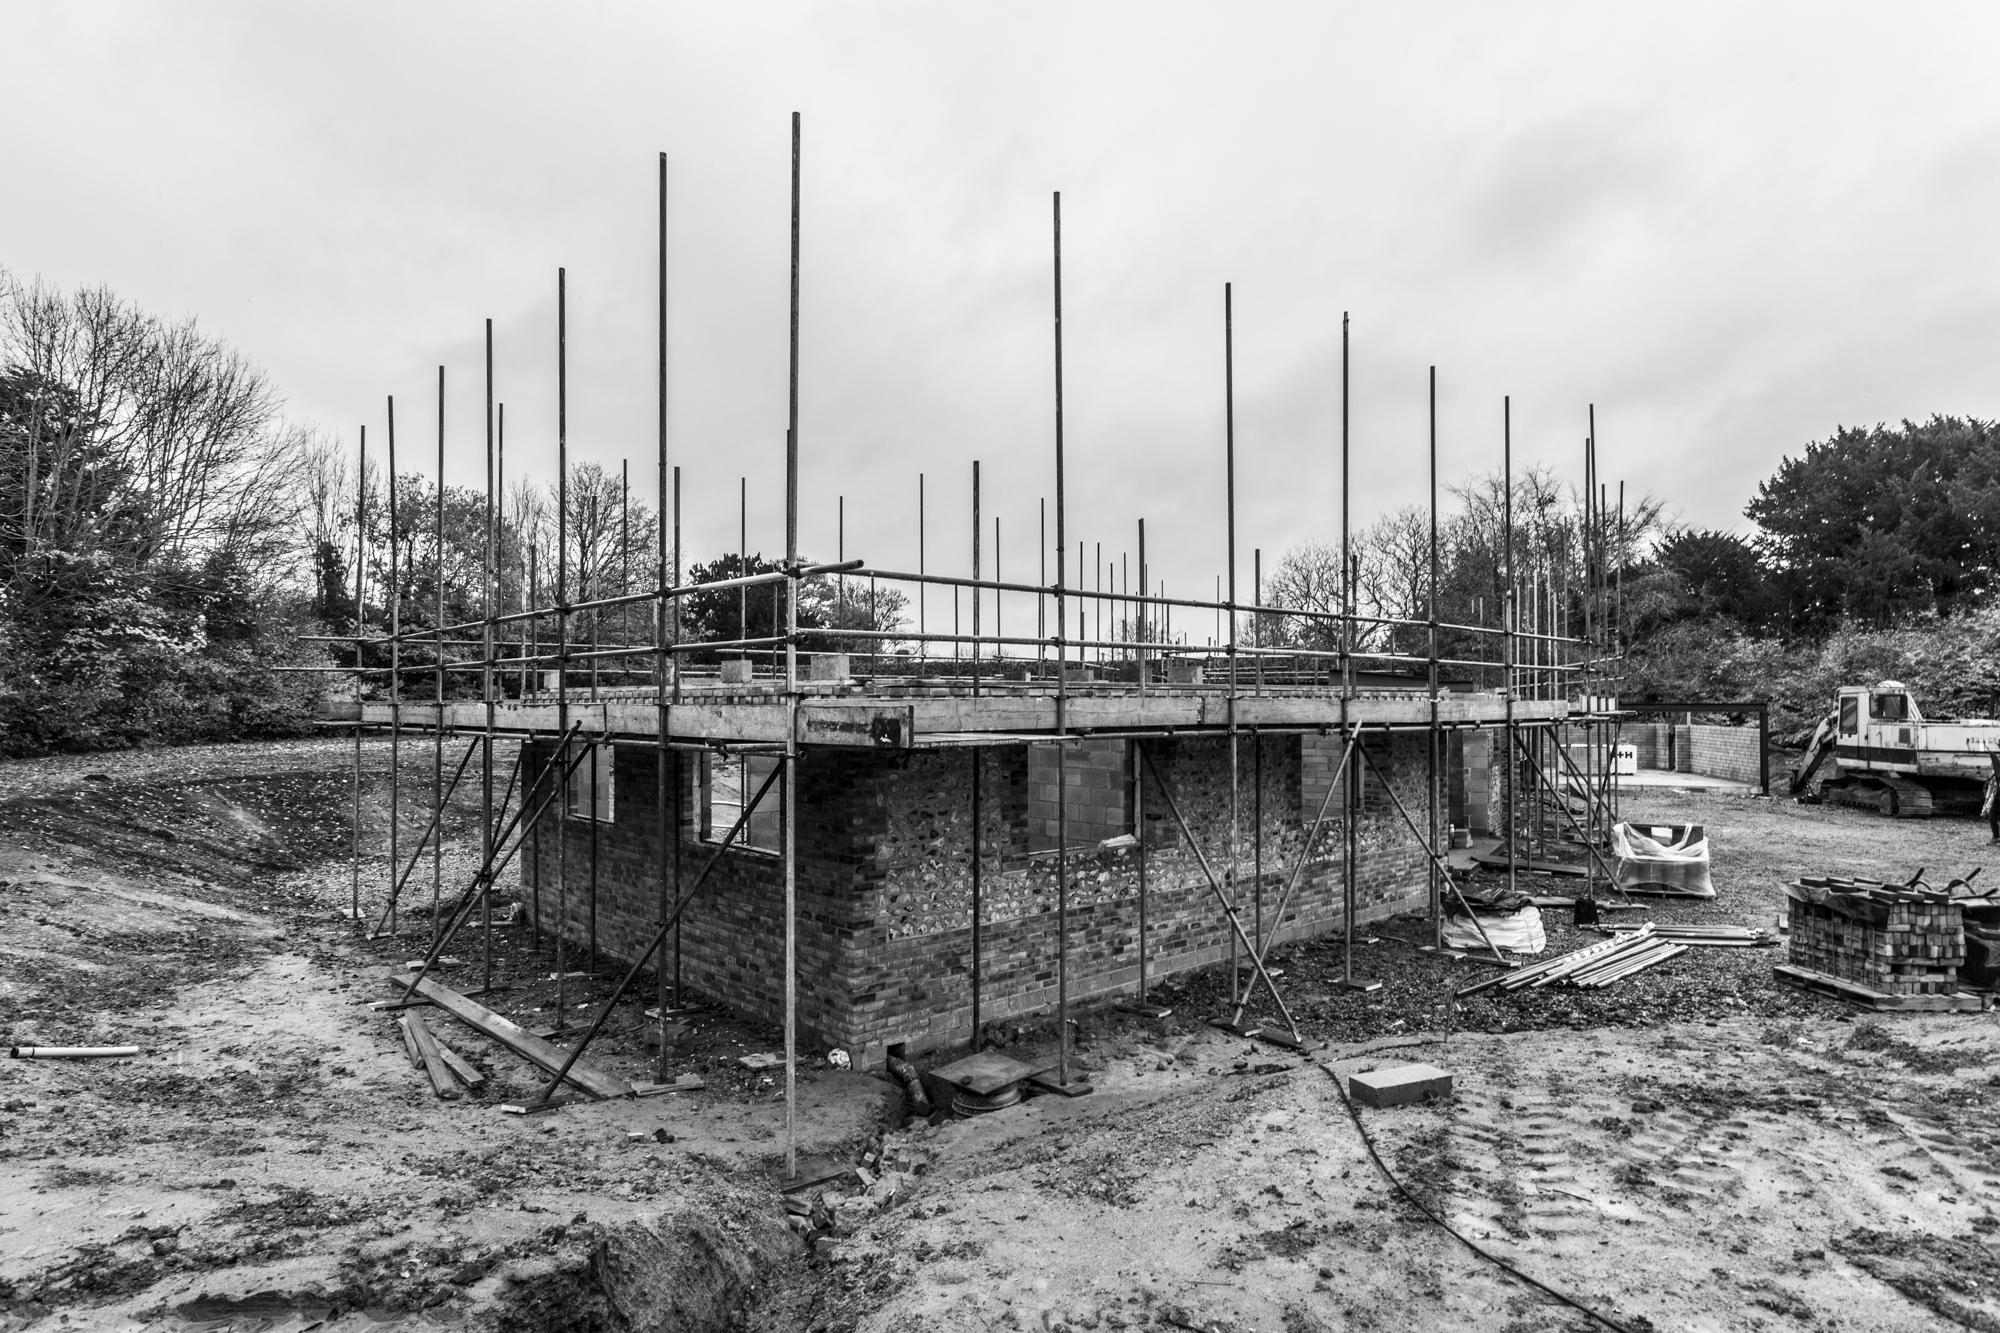 FlinthurstHouse_Construction_09.jpg